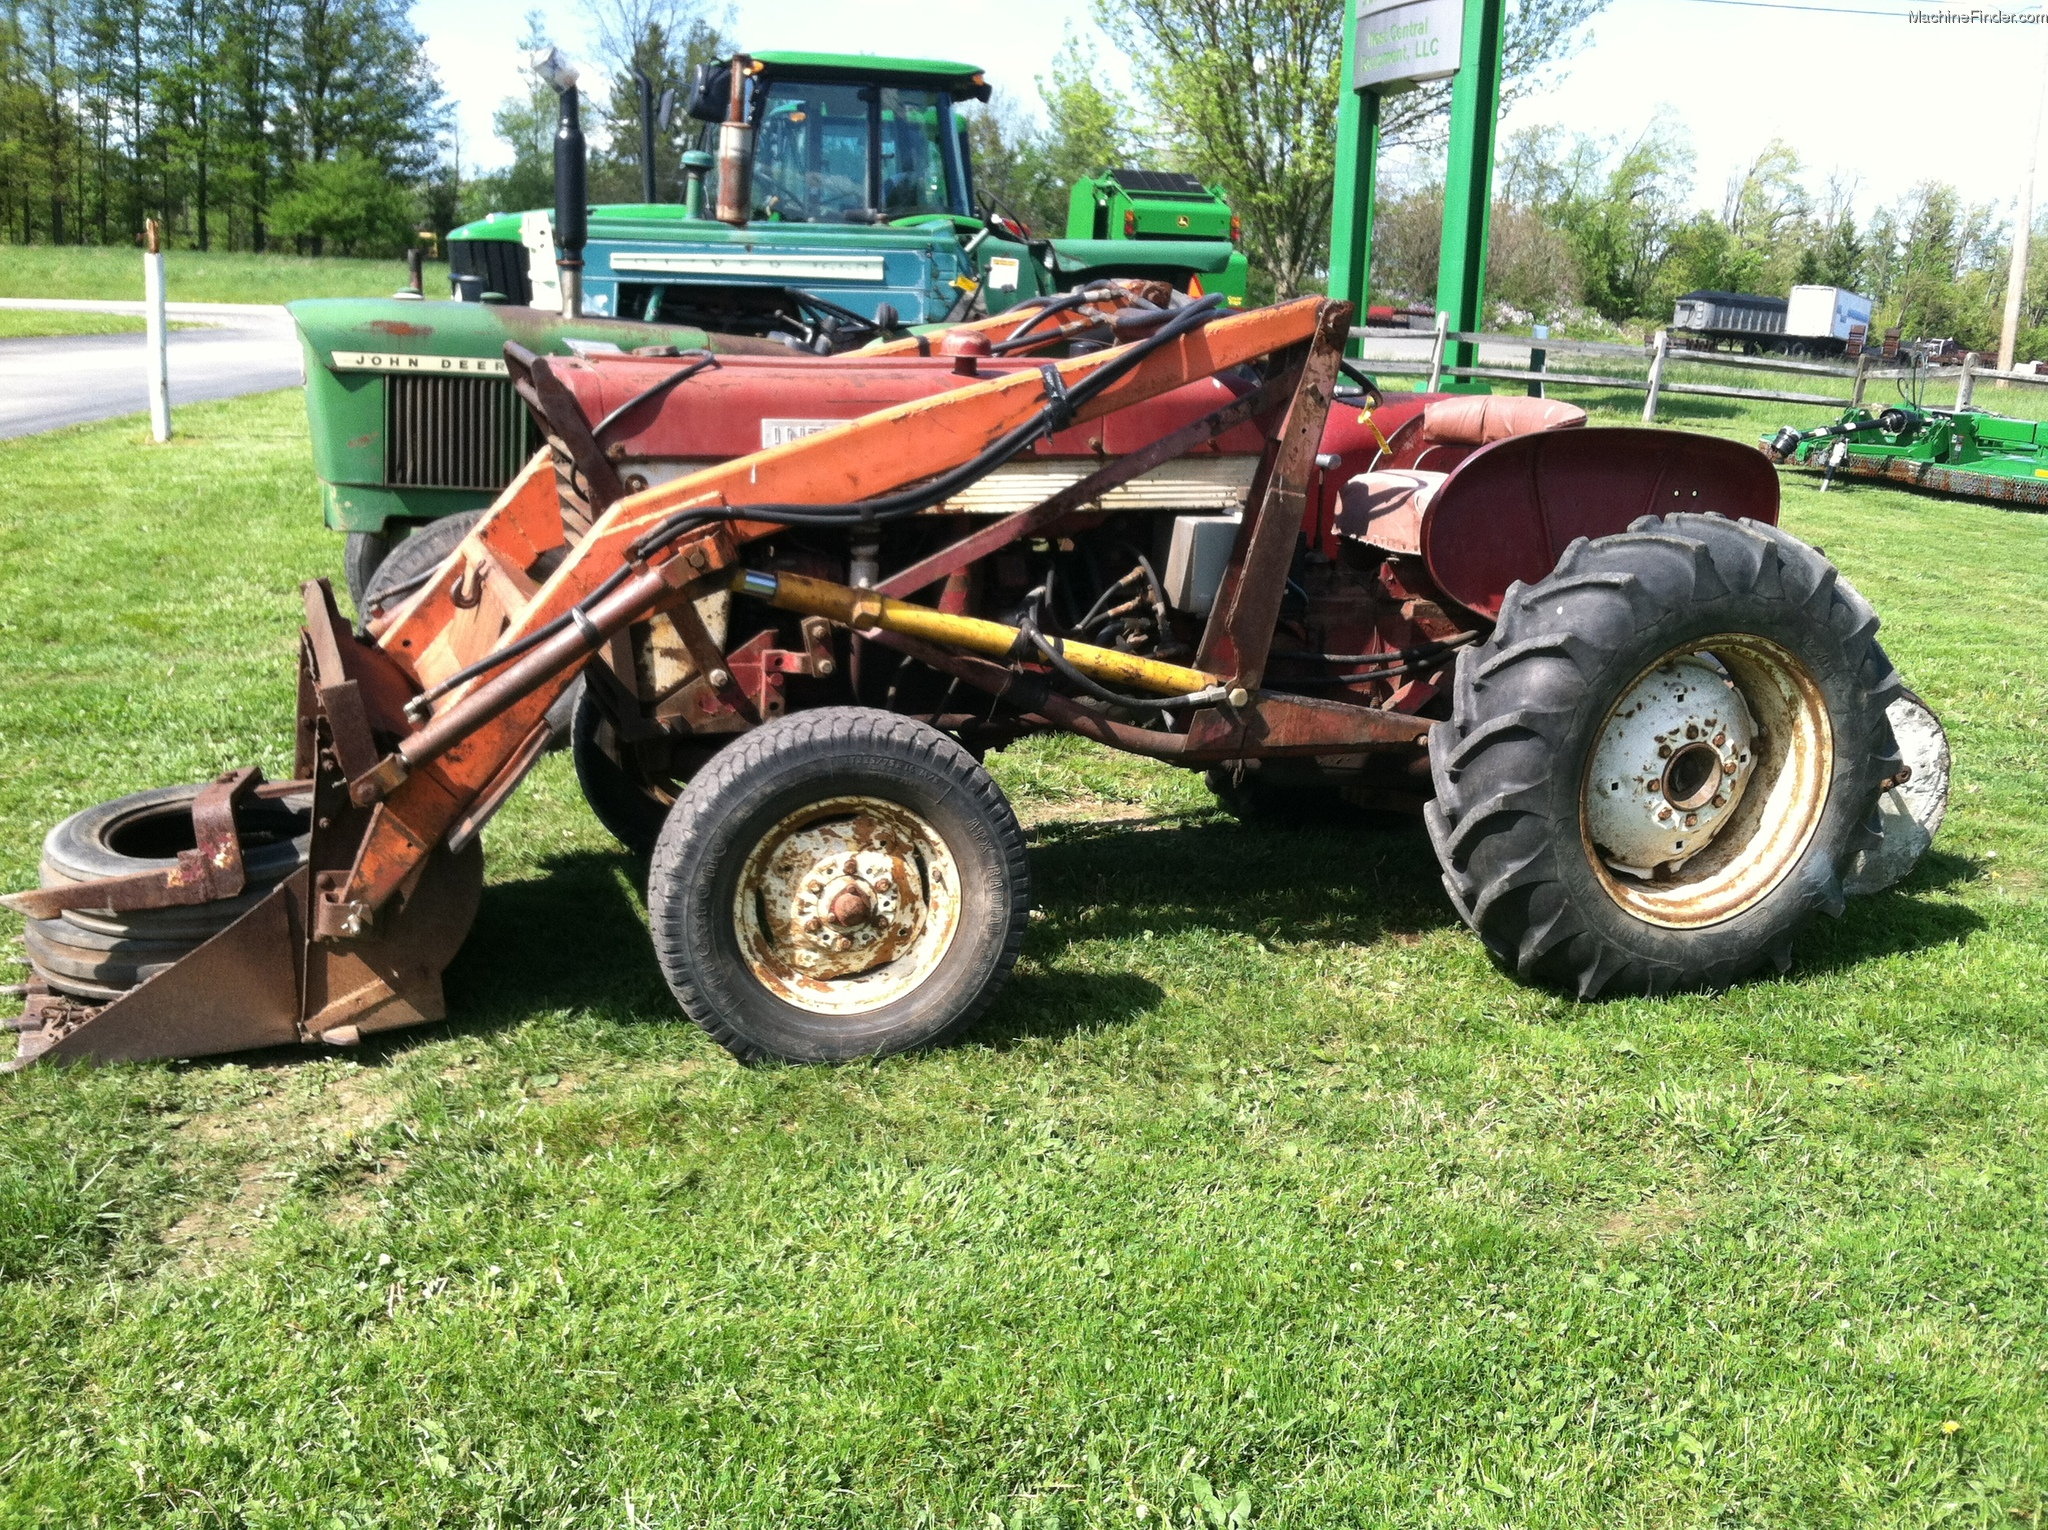 1958 International Tractor : International harvester tractors compact